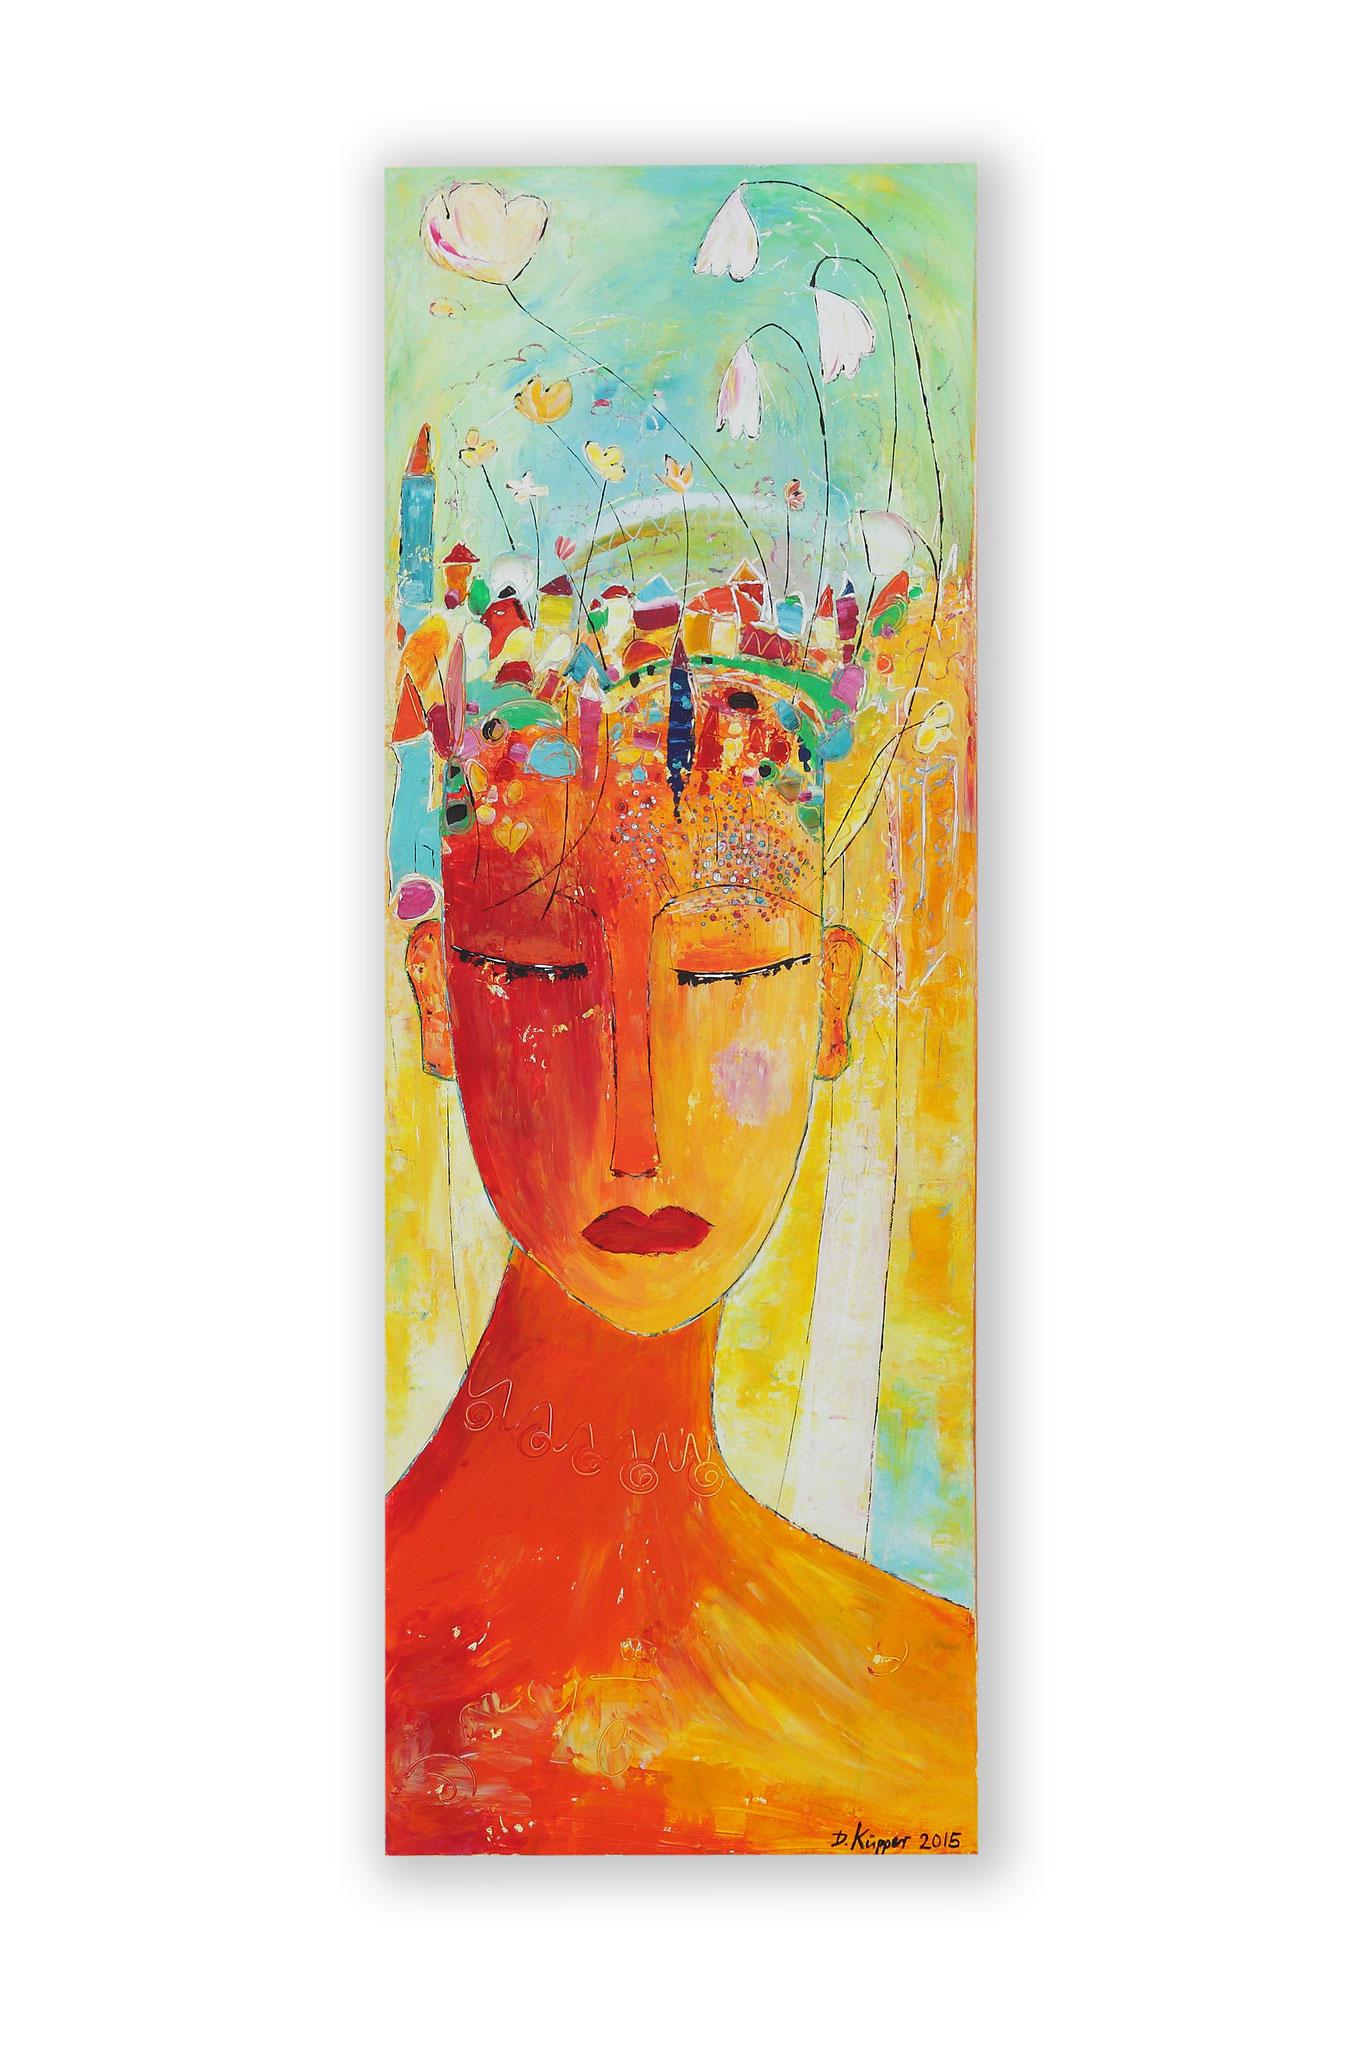 """Traum"" - 40x100cm - Preis: 230 Euro"